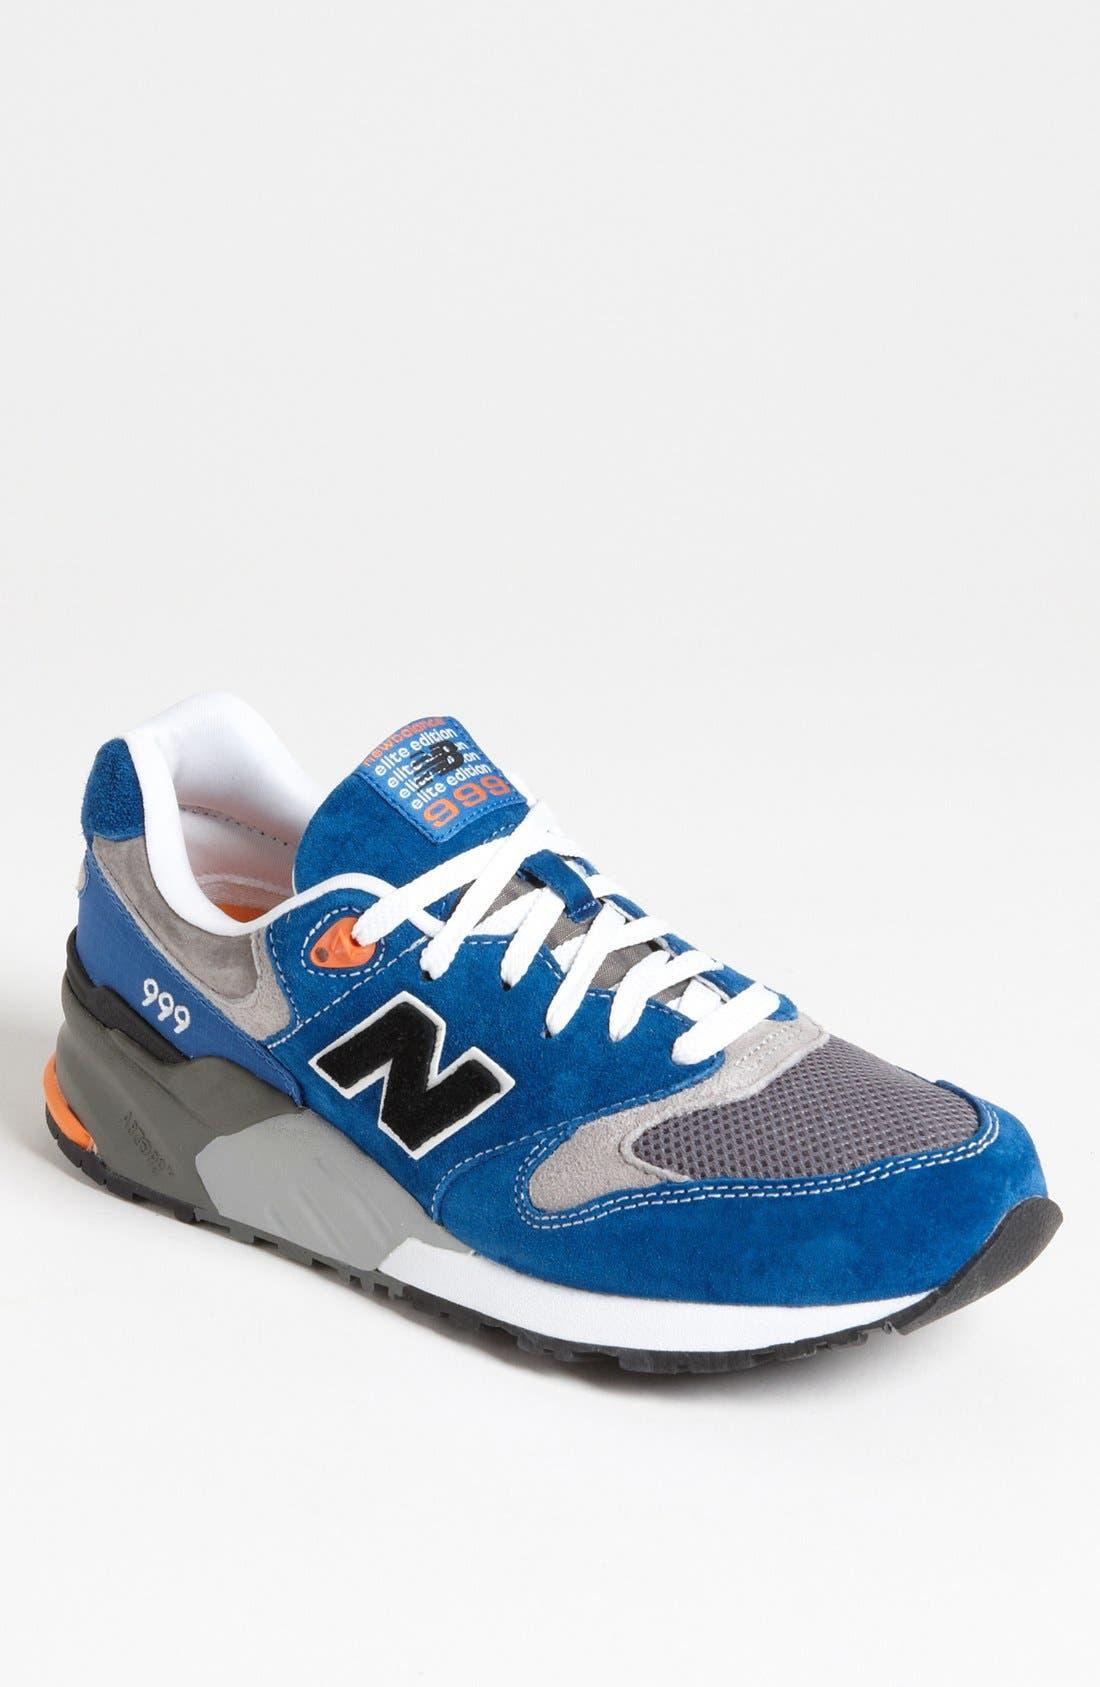 Main Image - New Balance '999 Bringback' Sneaker (Men) (Online Only)